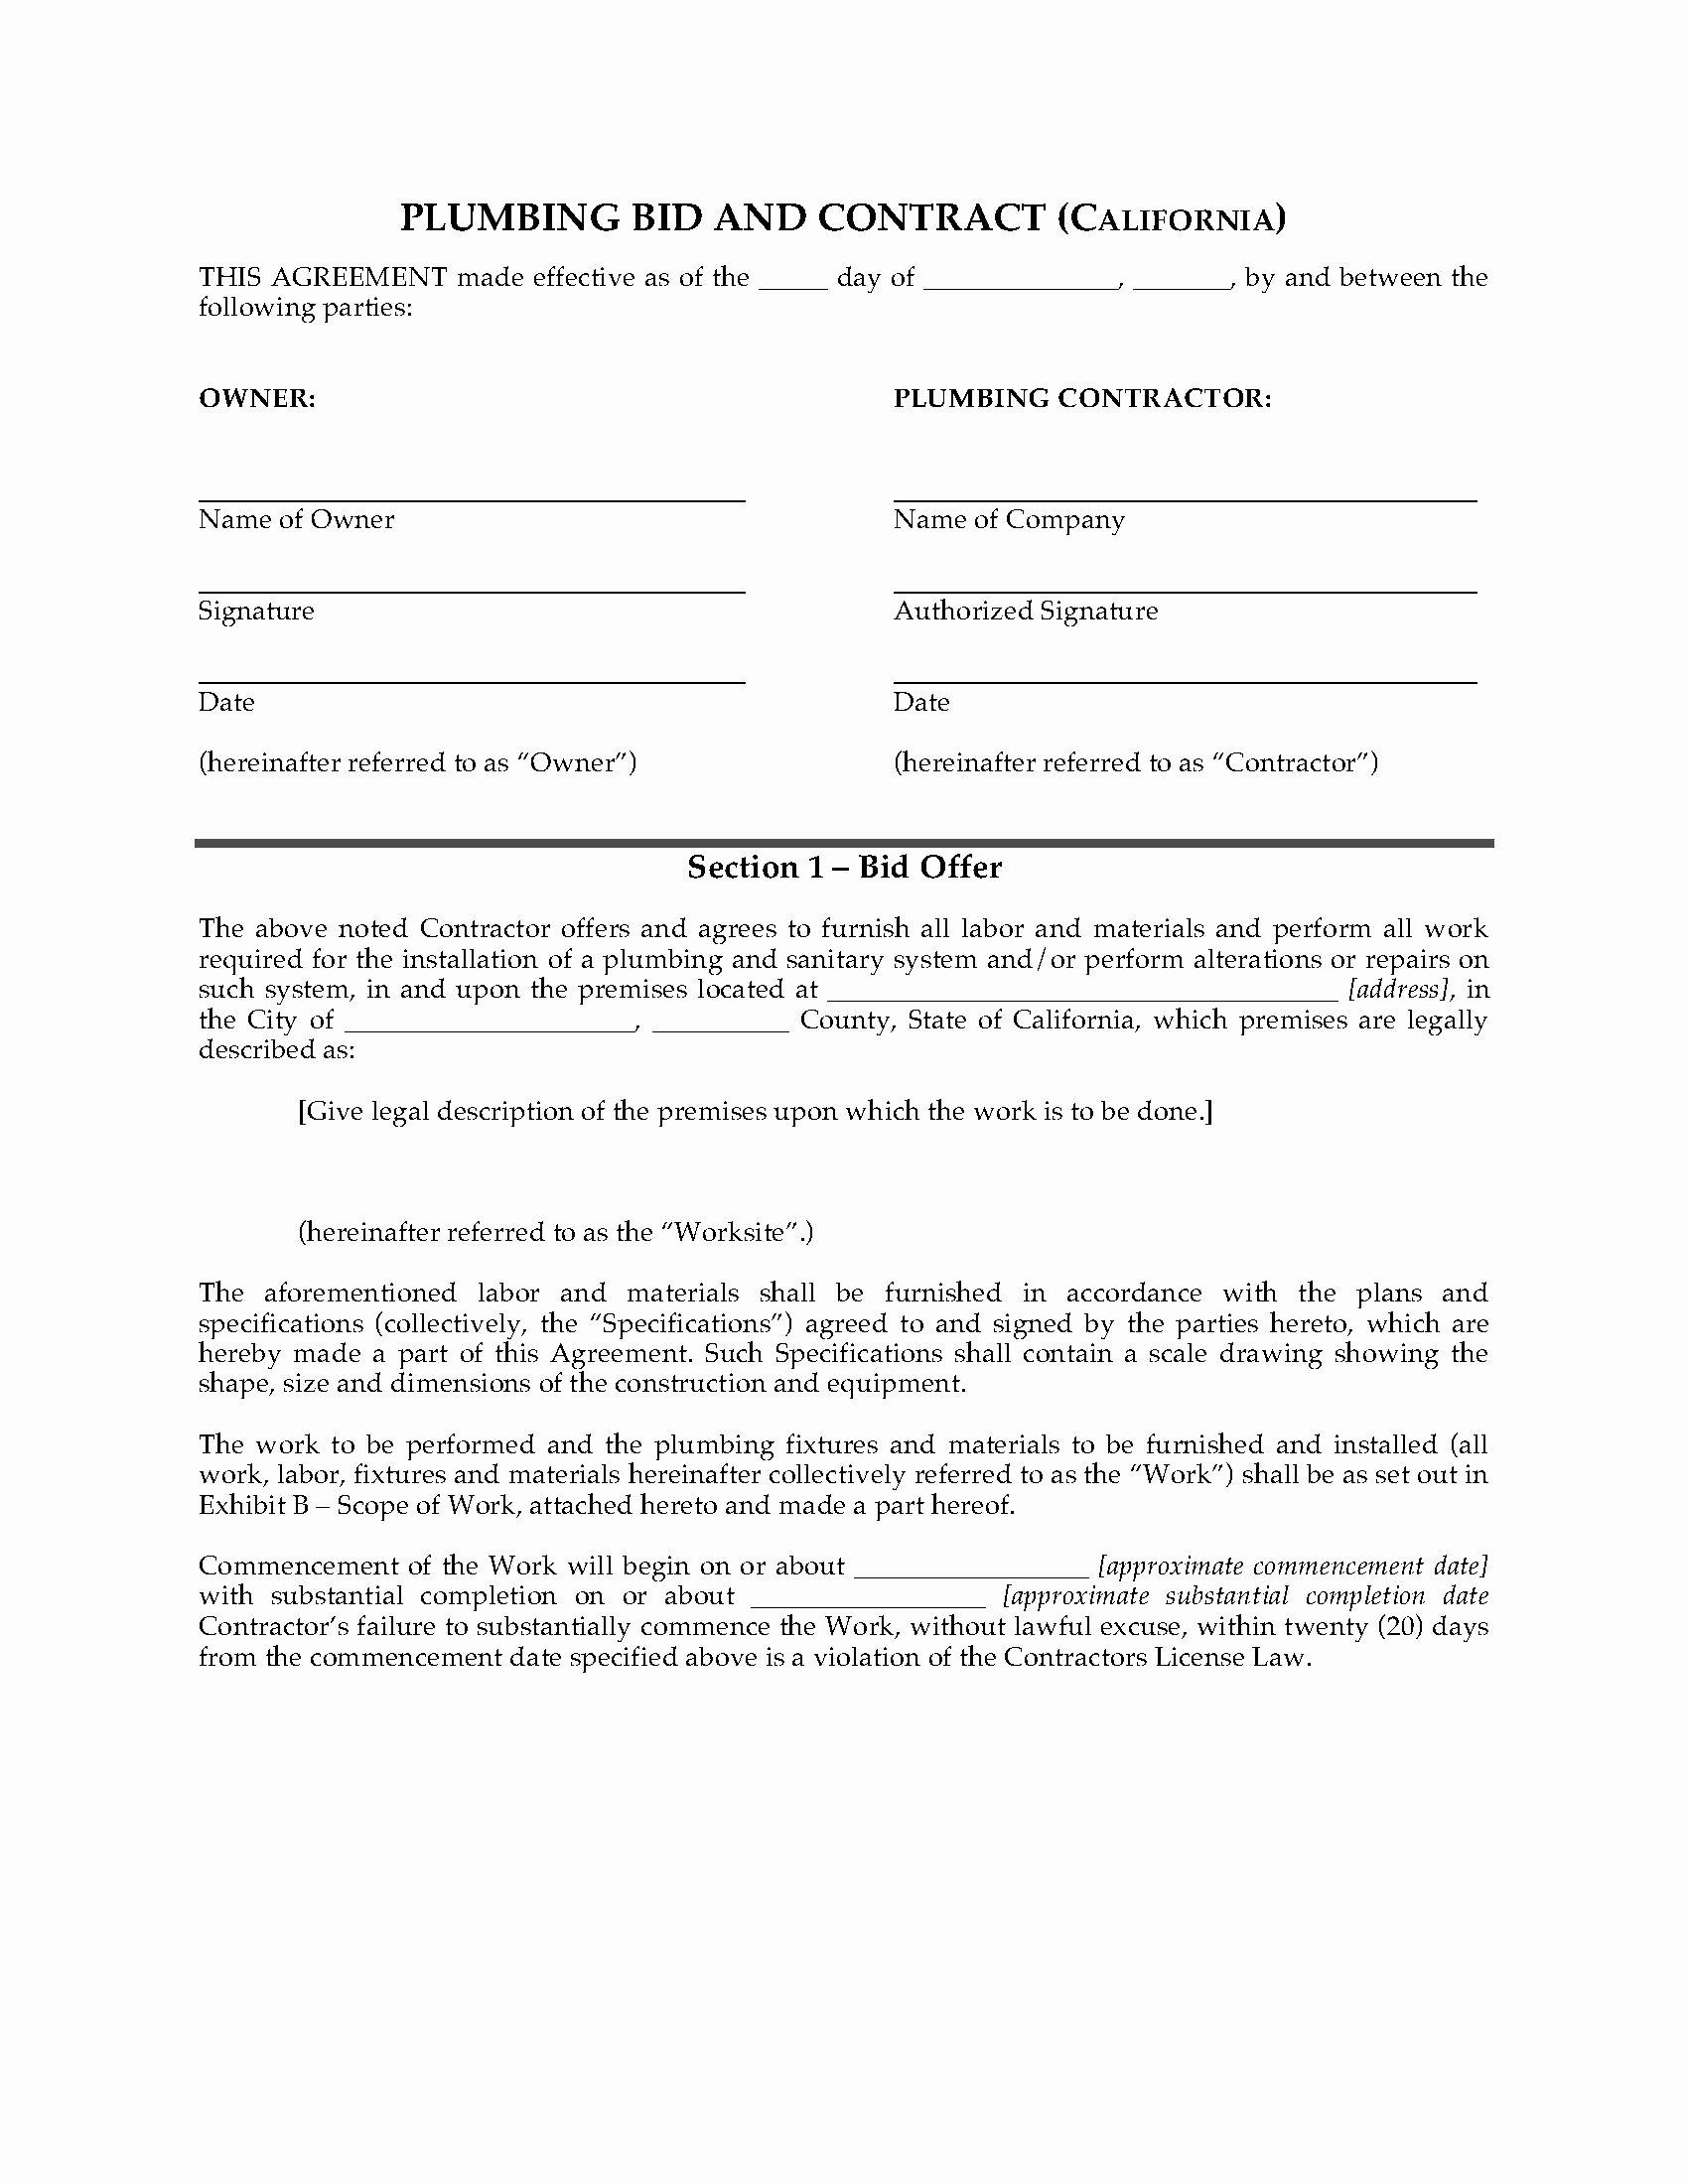 Bid Template for Contractors Elegant California Plumbing Bid and Contract